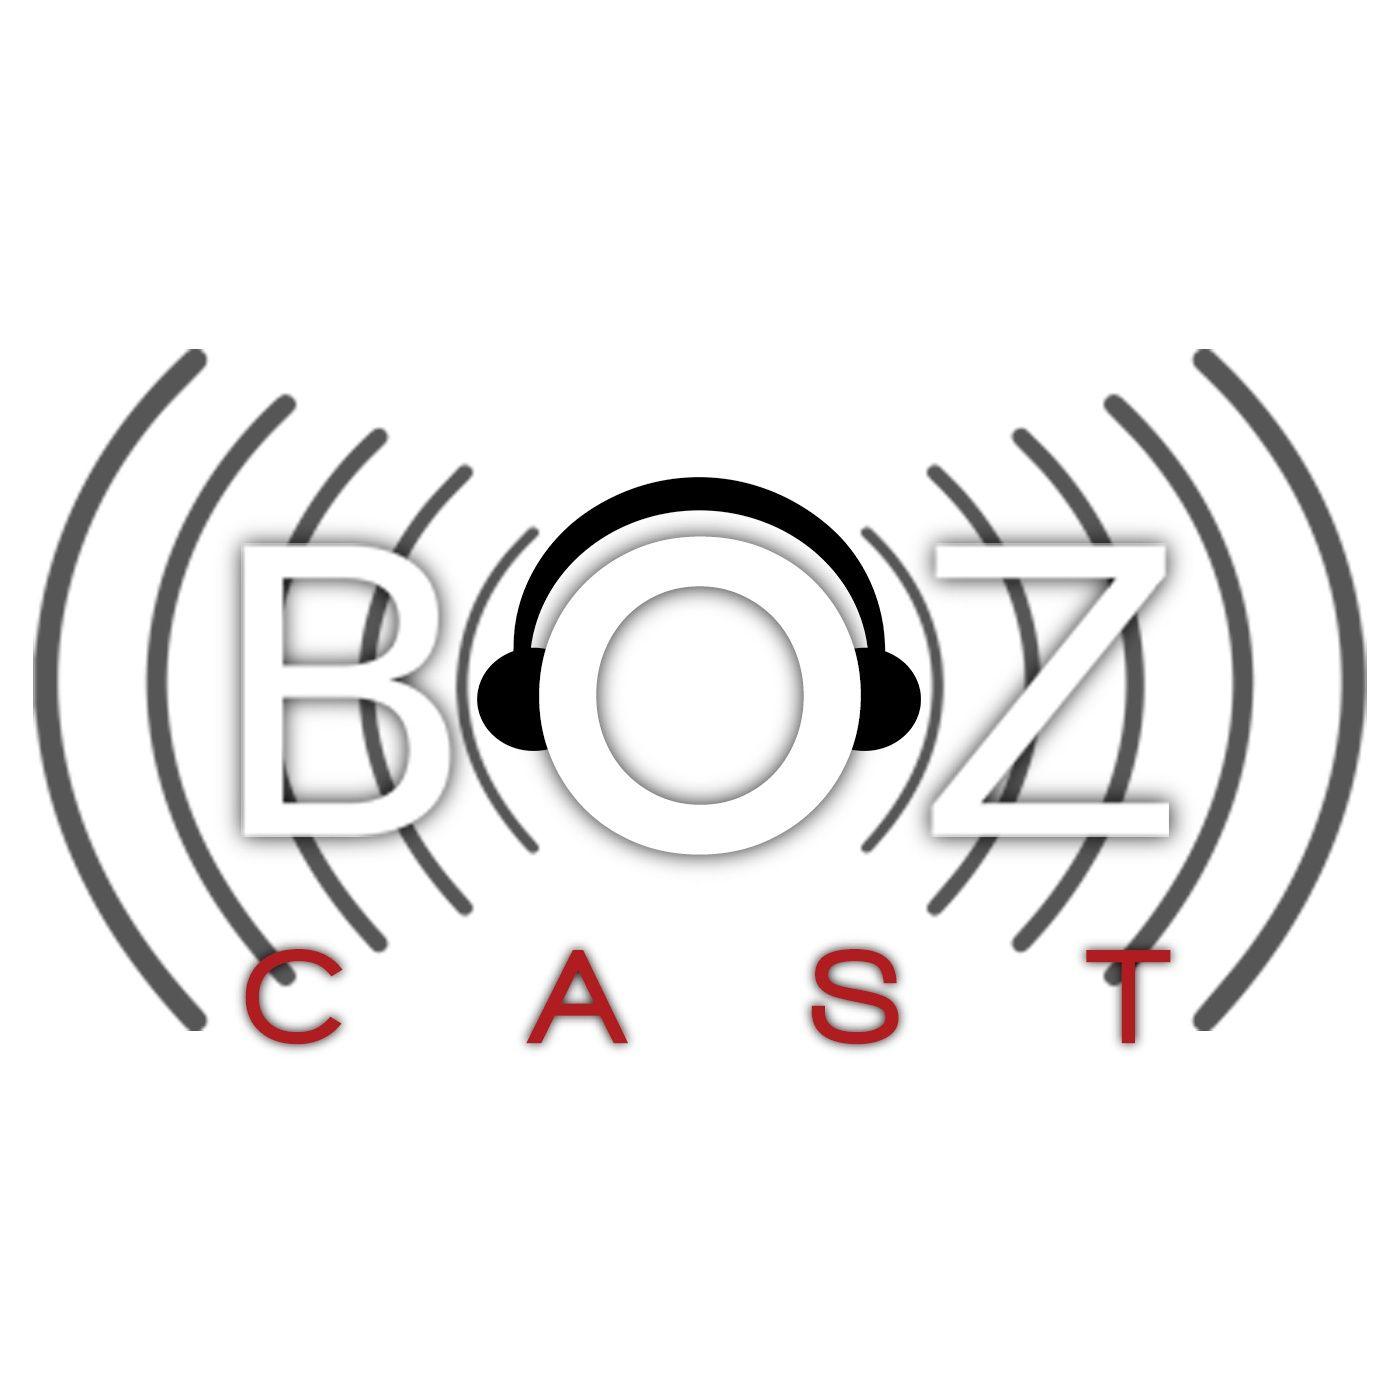 Ep 004 BozCast Illusions